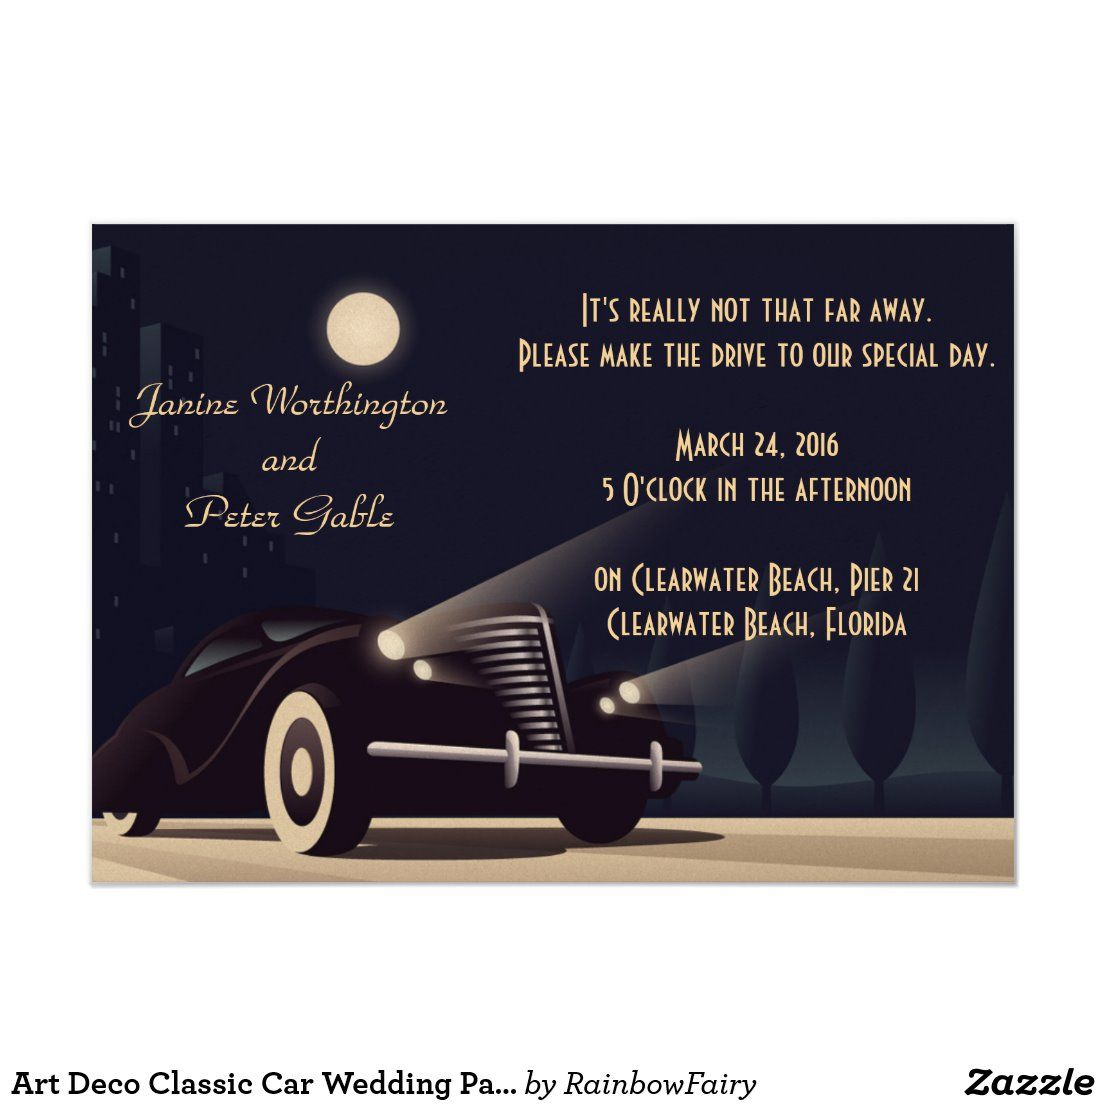 Art Deco Classic Car Wedding Party Invitation | Zazzle.com